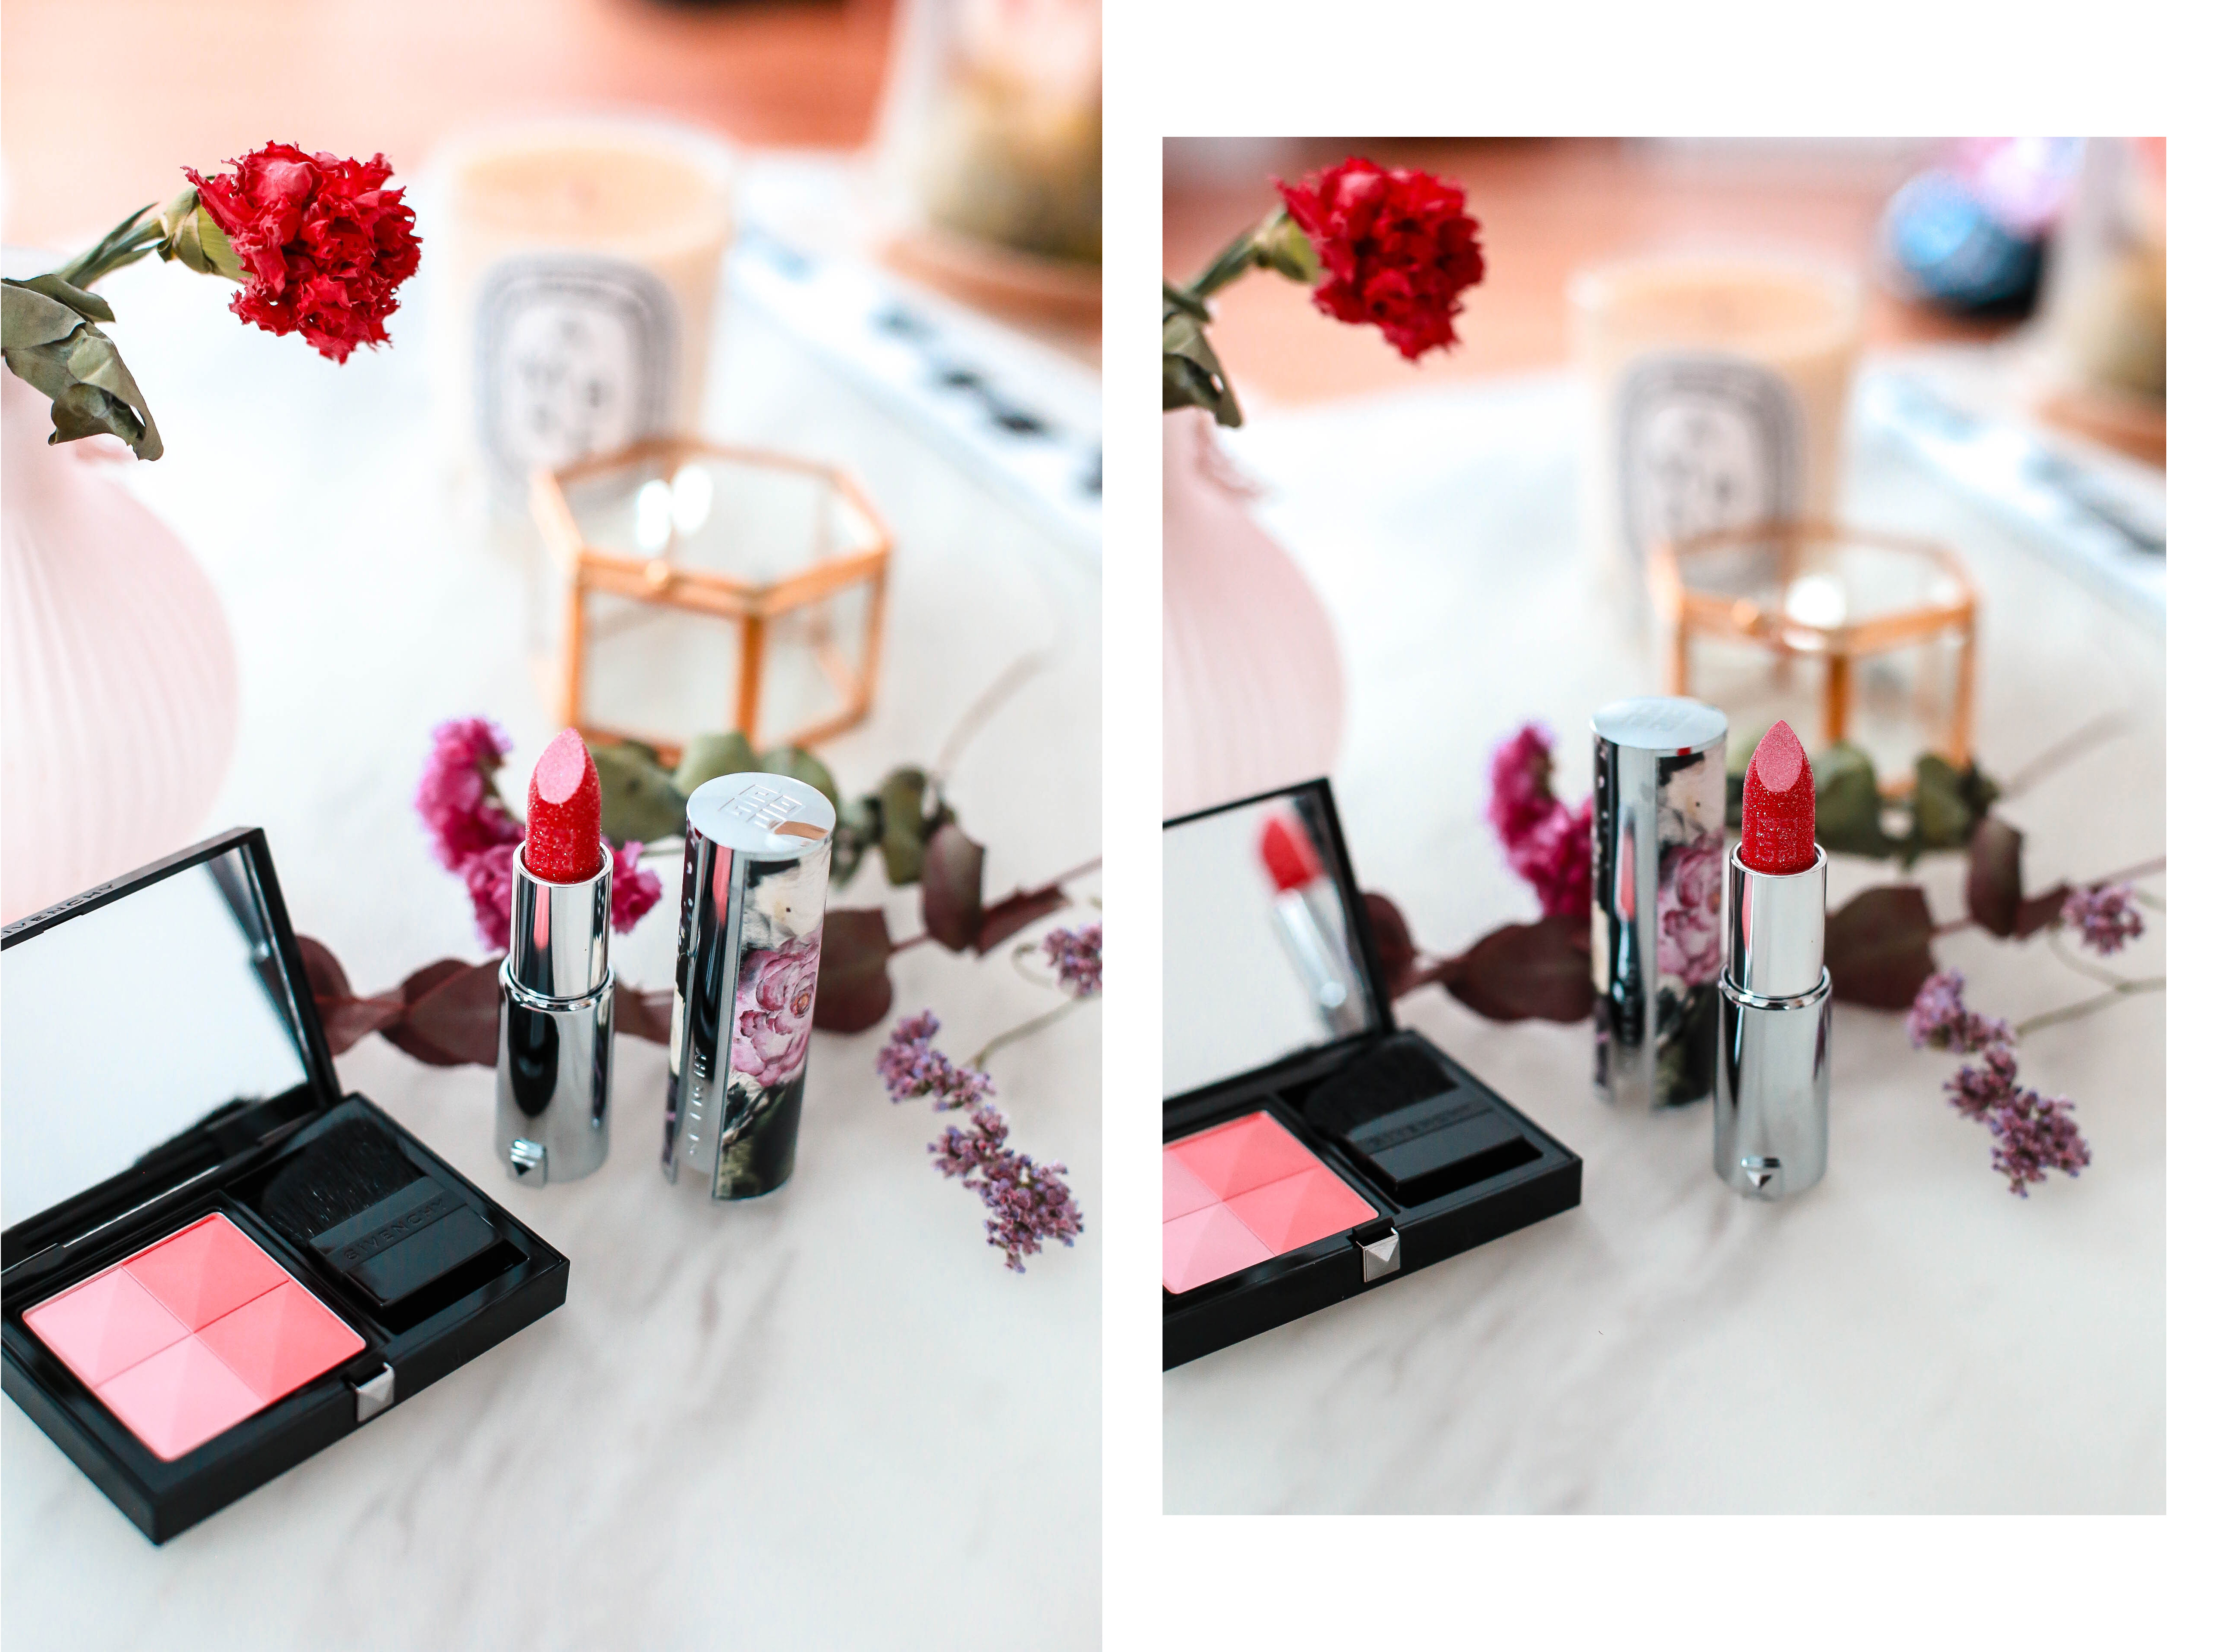 Le Rouge Édition Limitée Givenchy Gardens Collection 2020